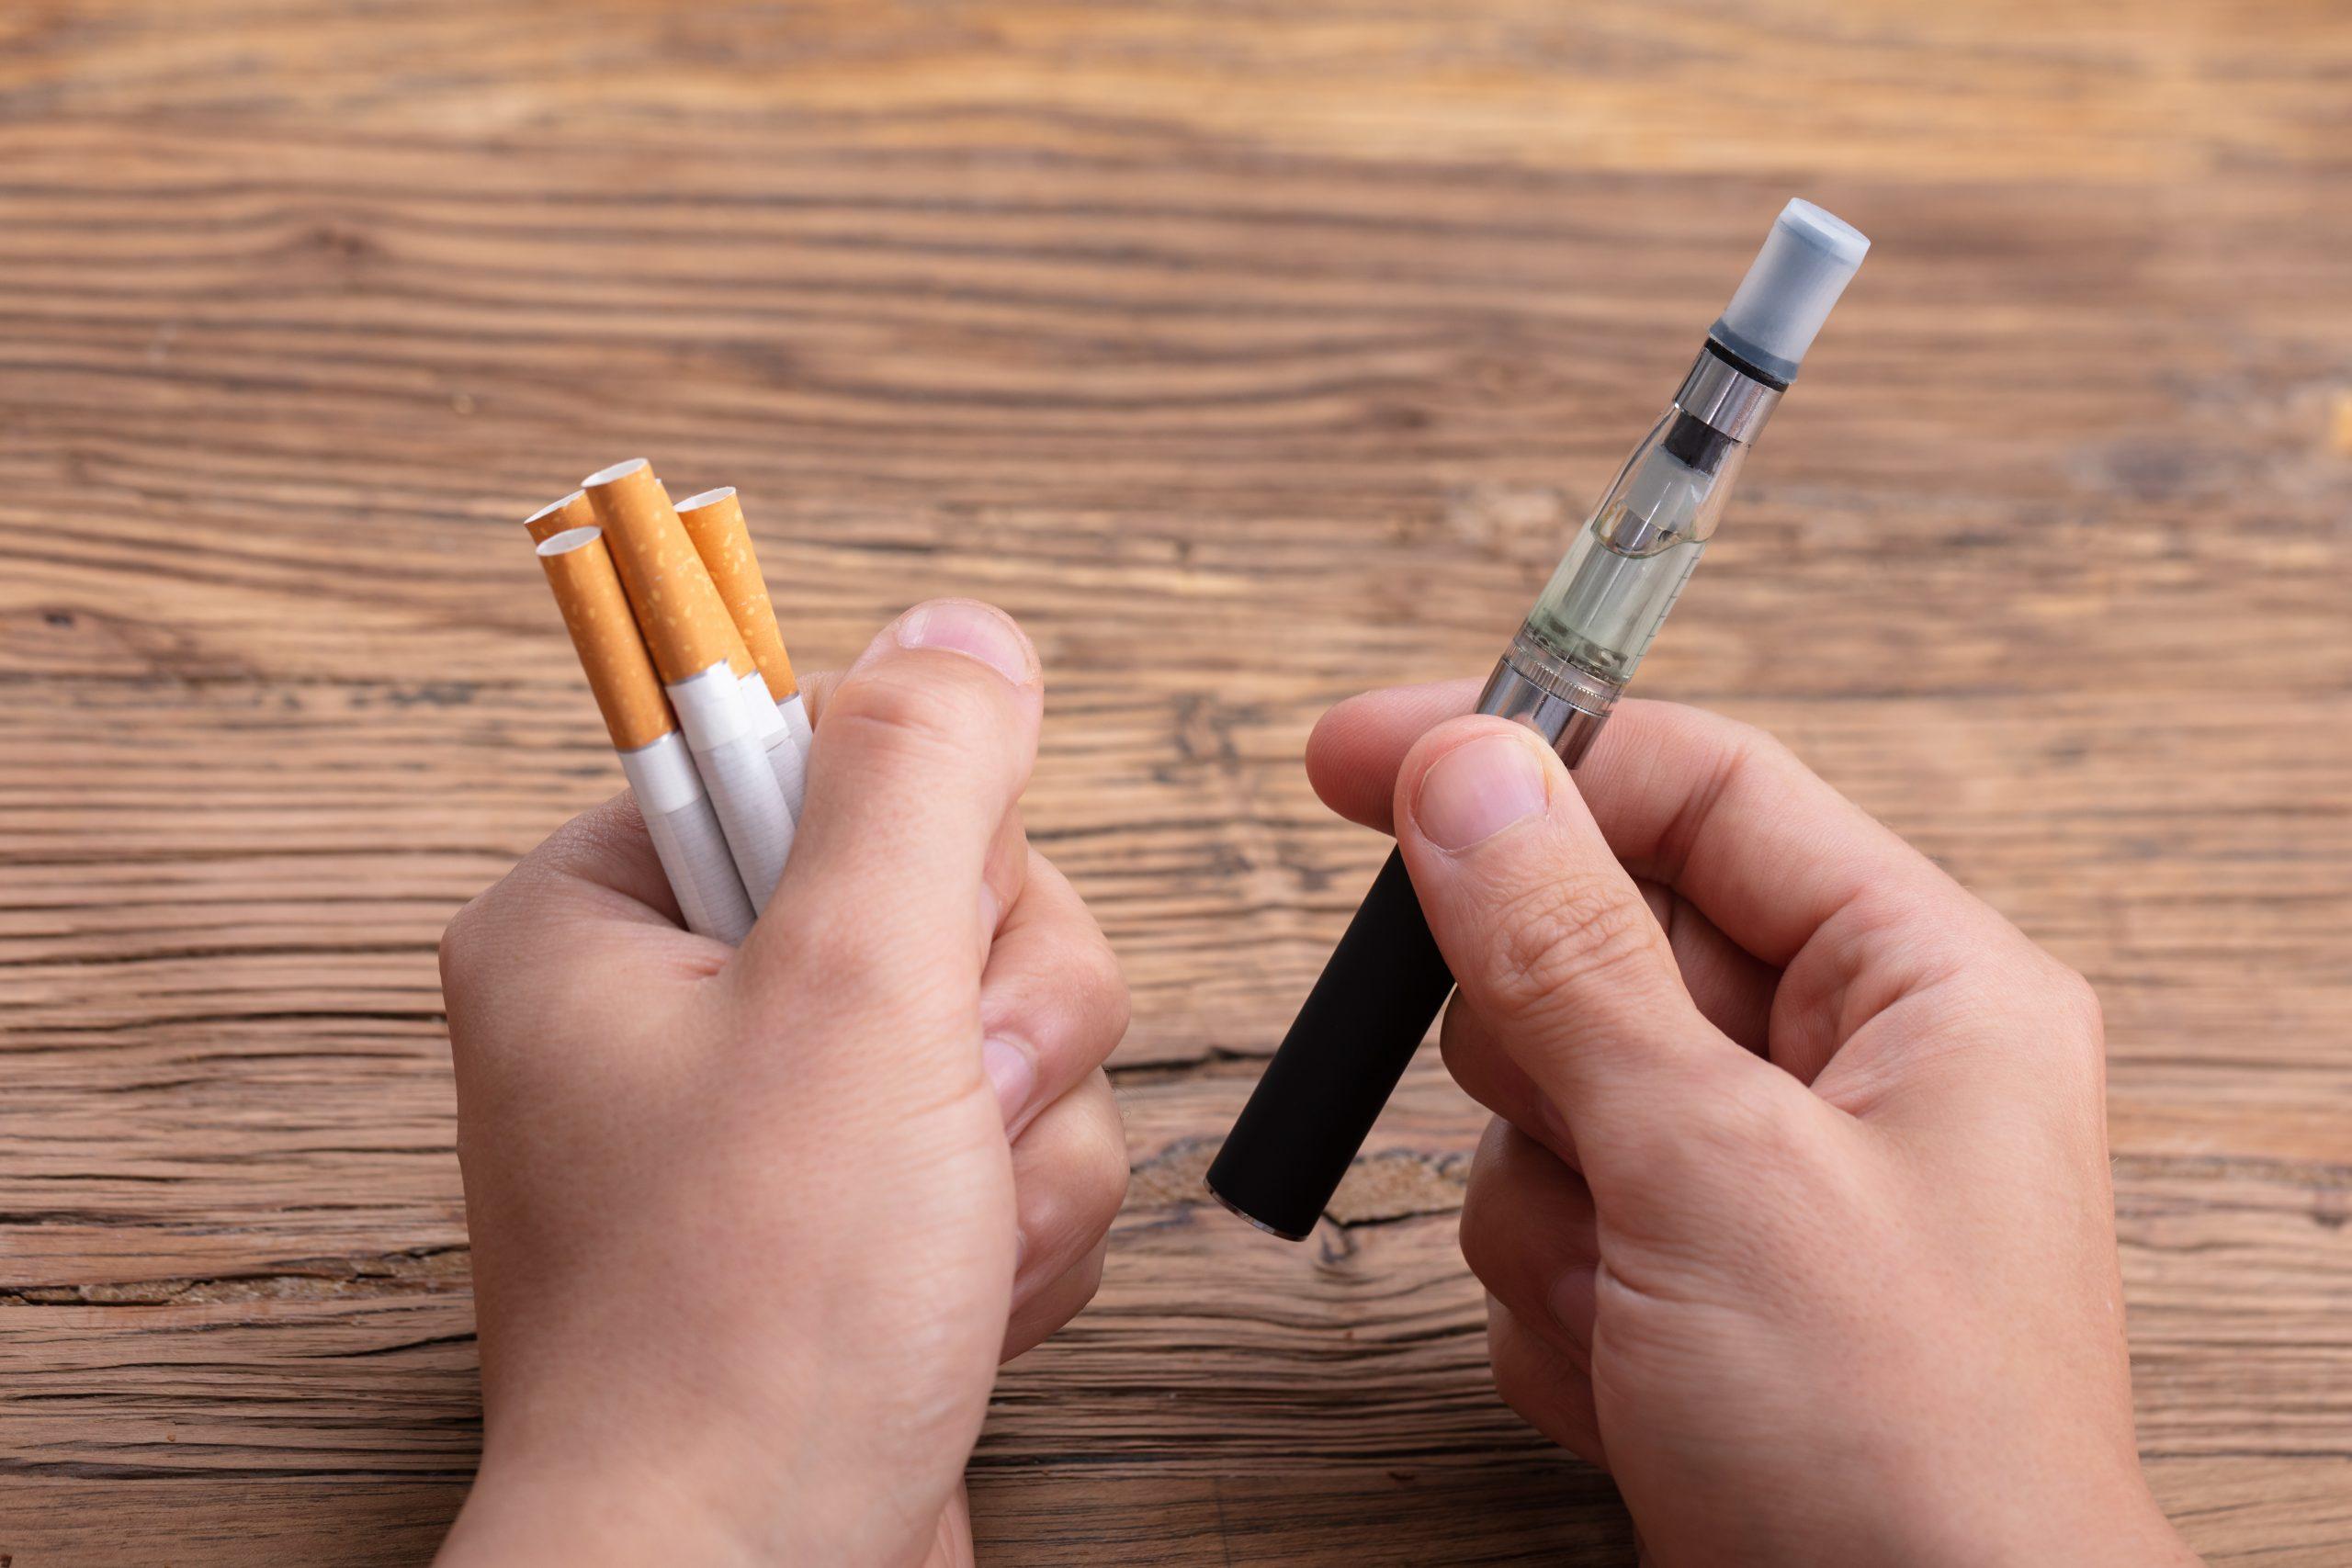 Dual Smoking and Vaping Doesn't Cut Cardiovascular Risk: Boston University Study